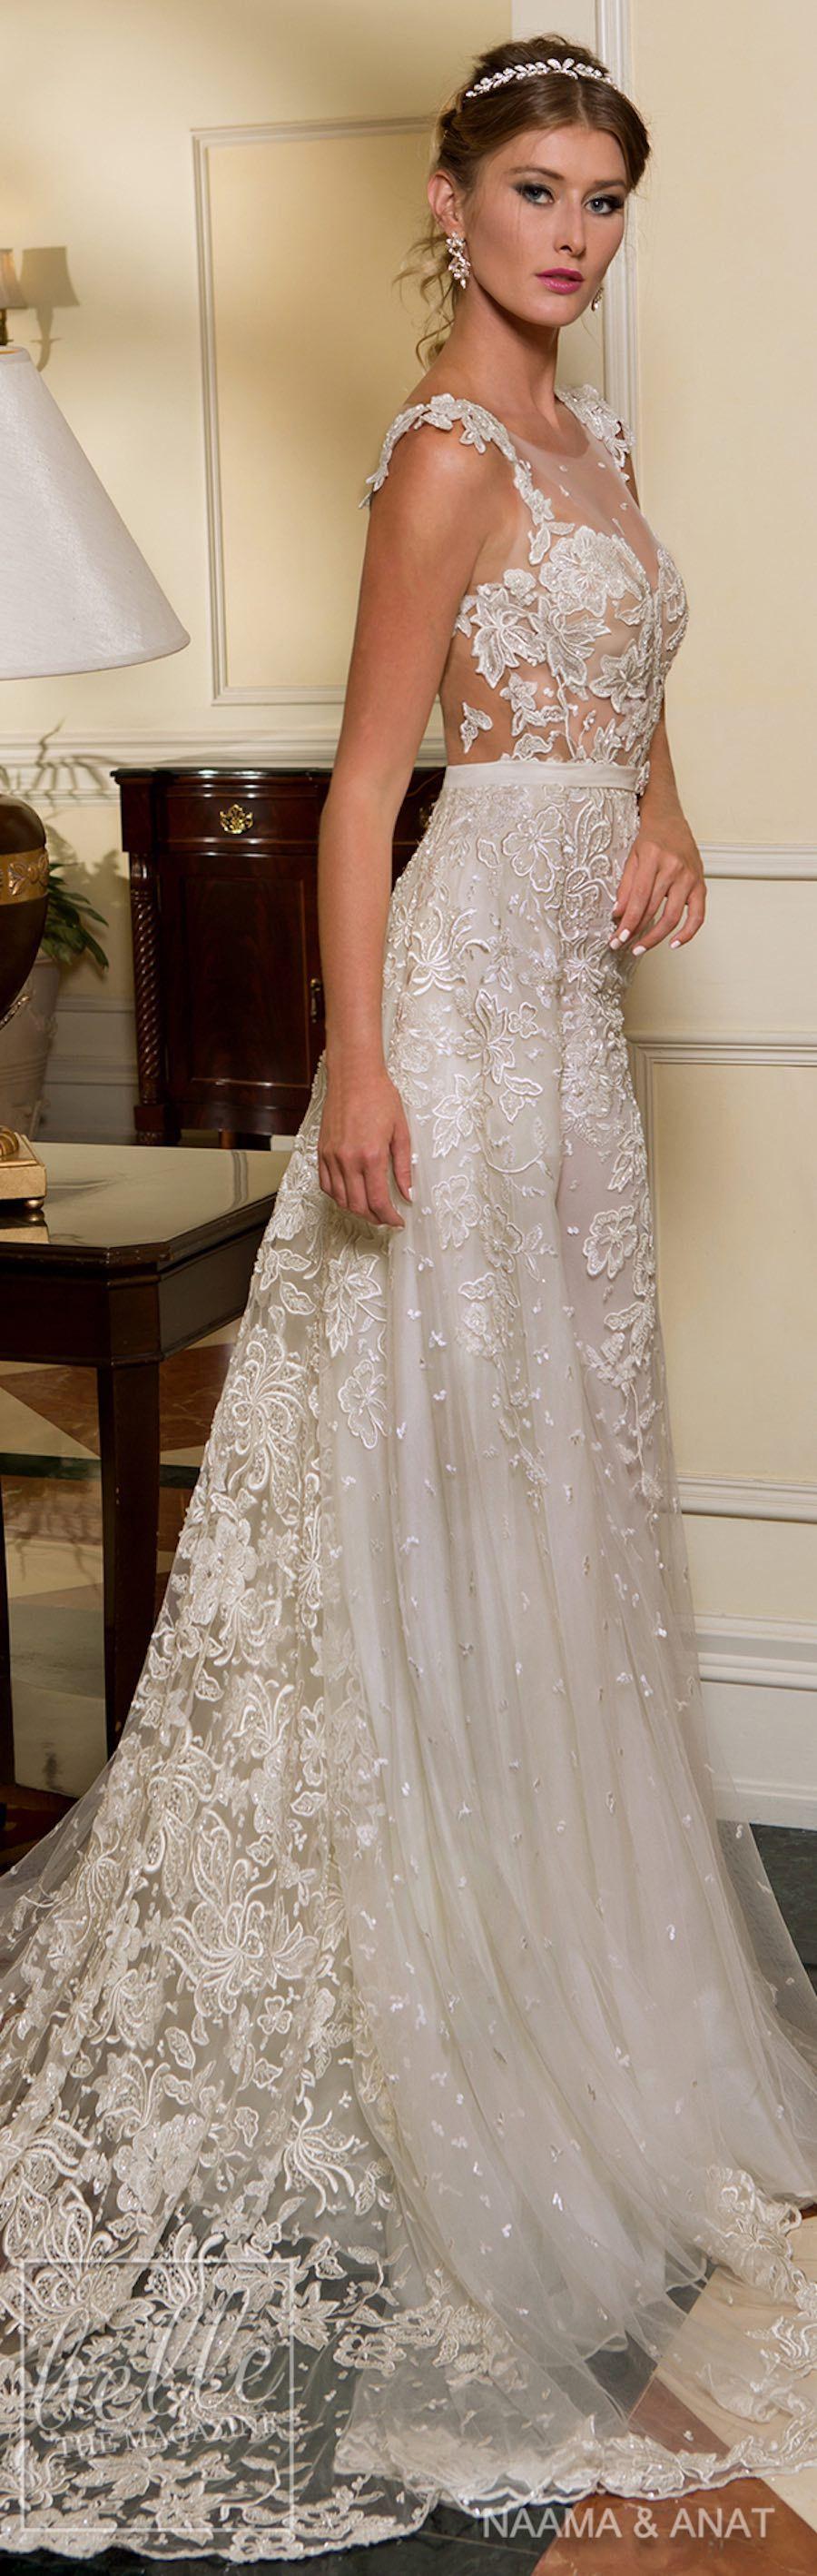 Dresses for wedding reception for bride  Naama u Anat  Wedding Dresses